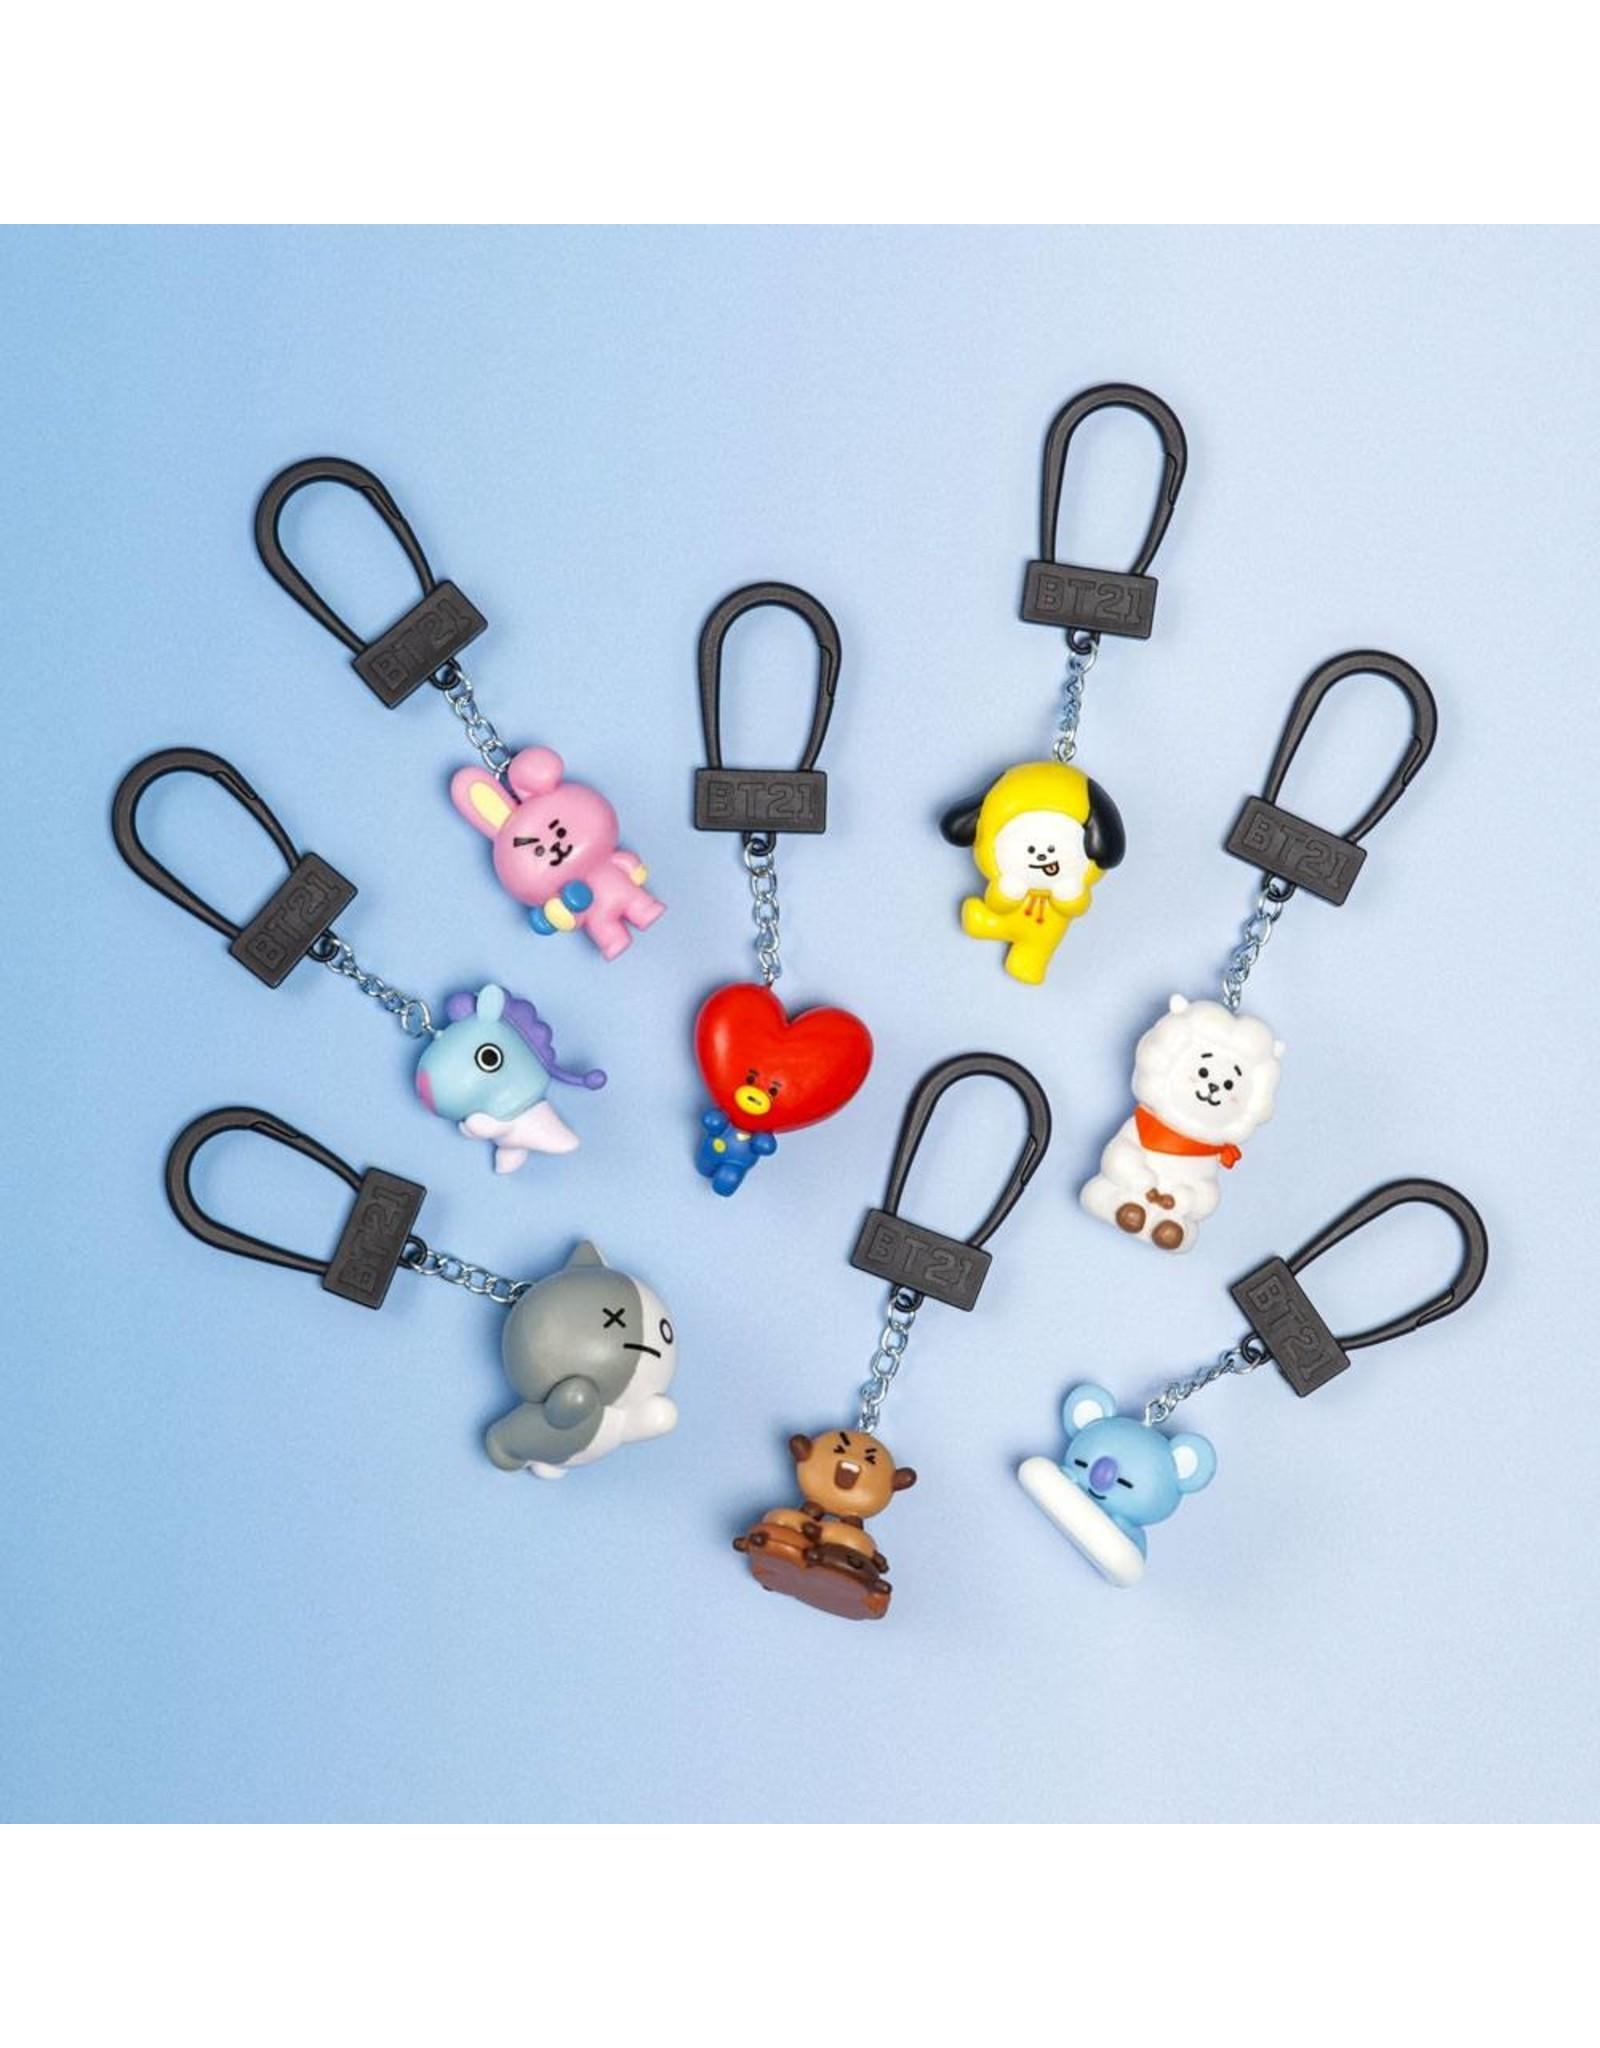 BT21 - Backpack Buddies Keychain - Mystery Bag